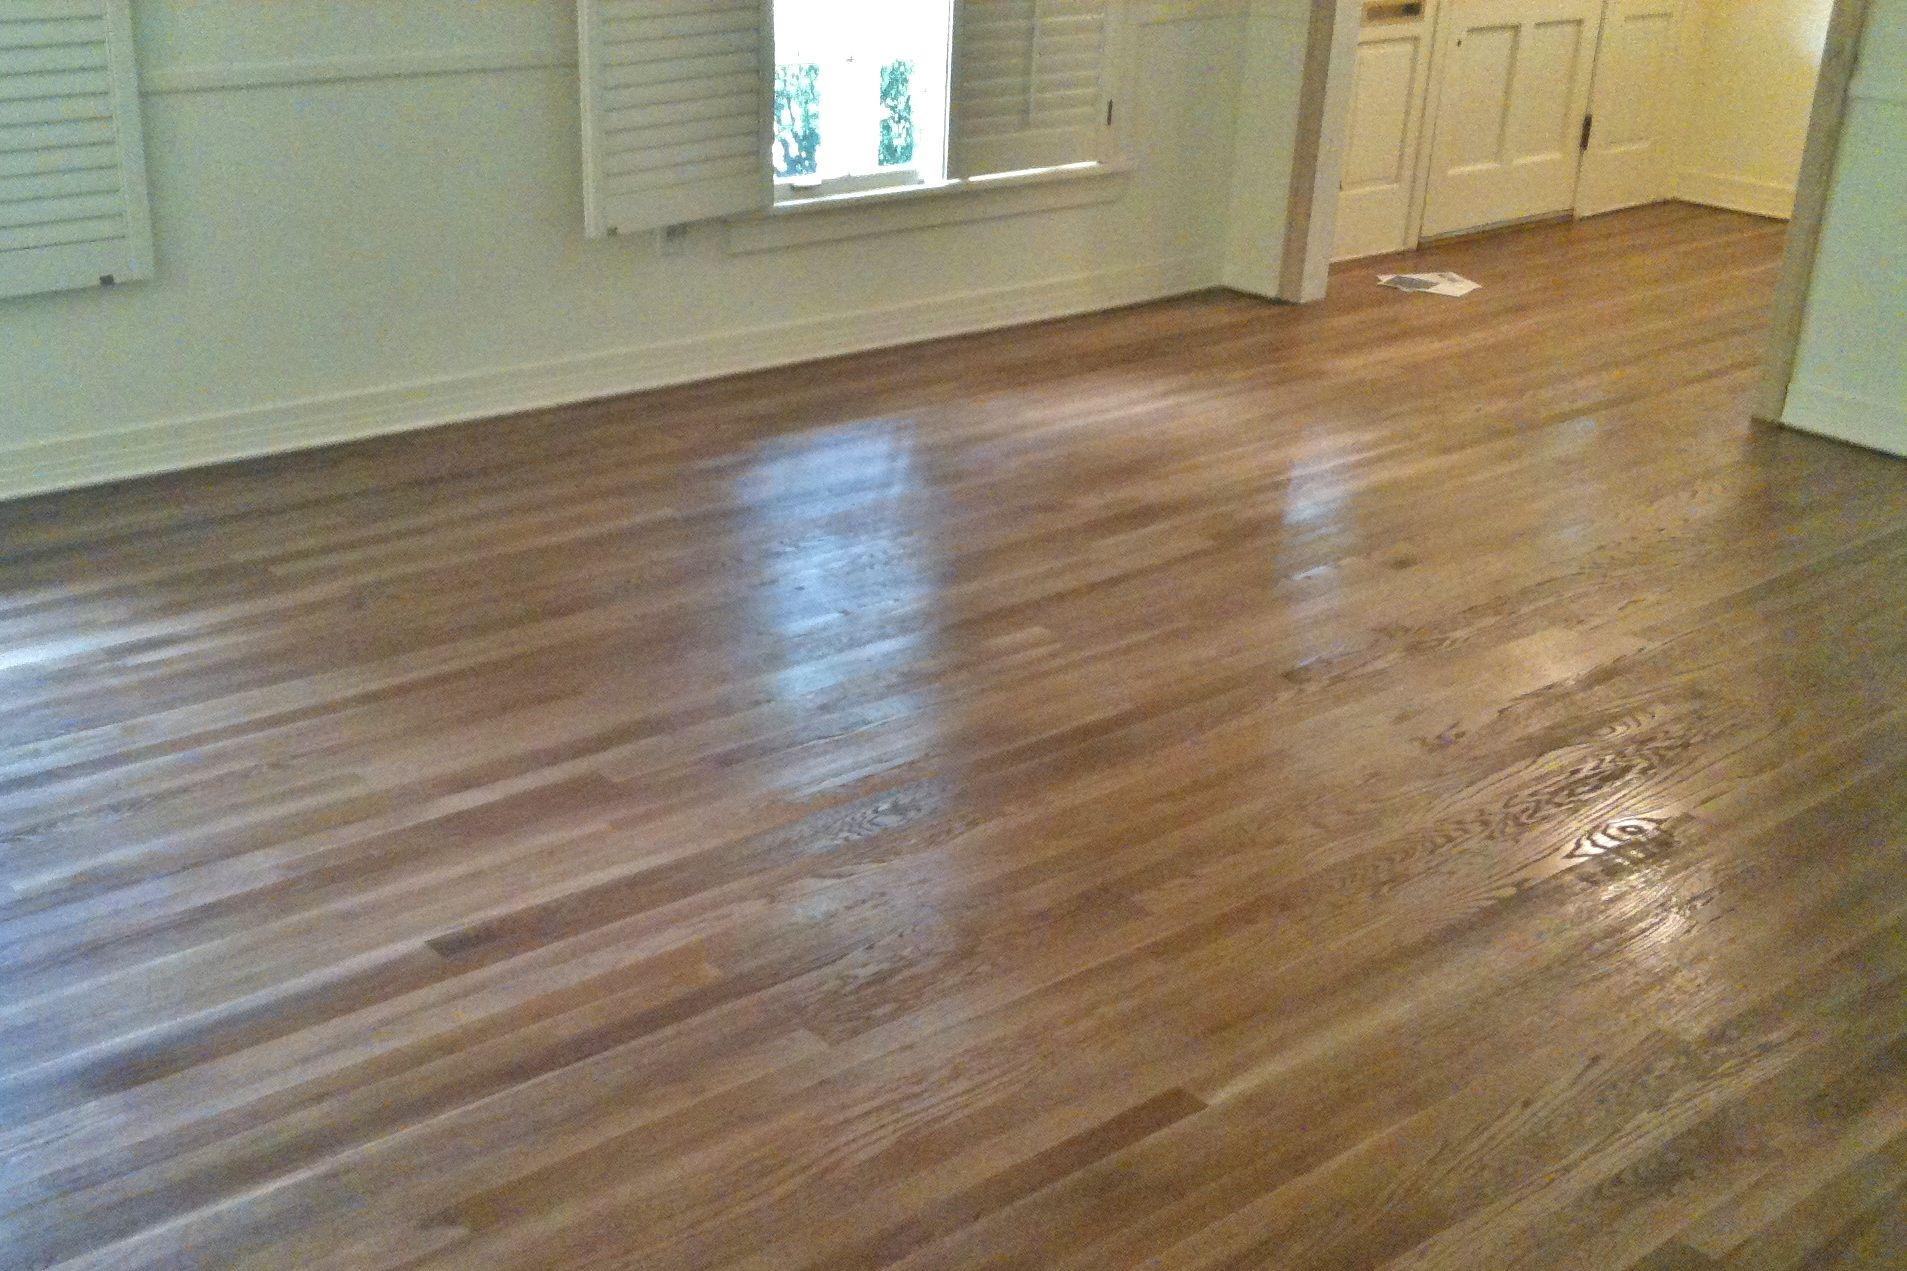 walnut hardwood flooring of oak meet special walnut home design pinterest flooring pertaining to minwax special walnut stain on oak hardwood floors